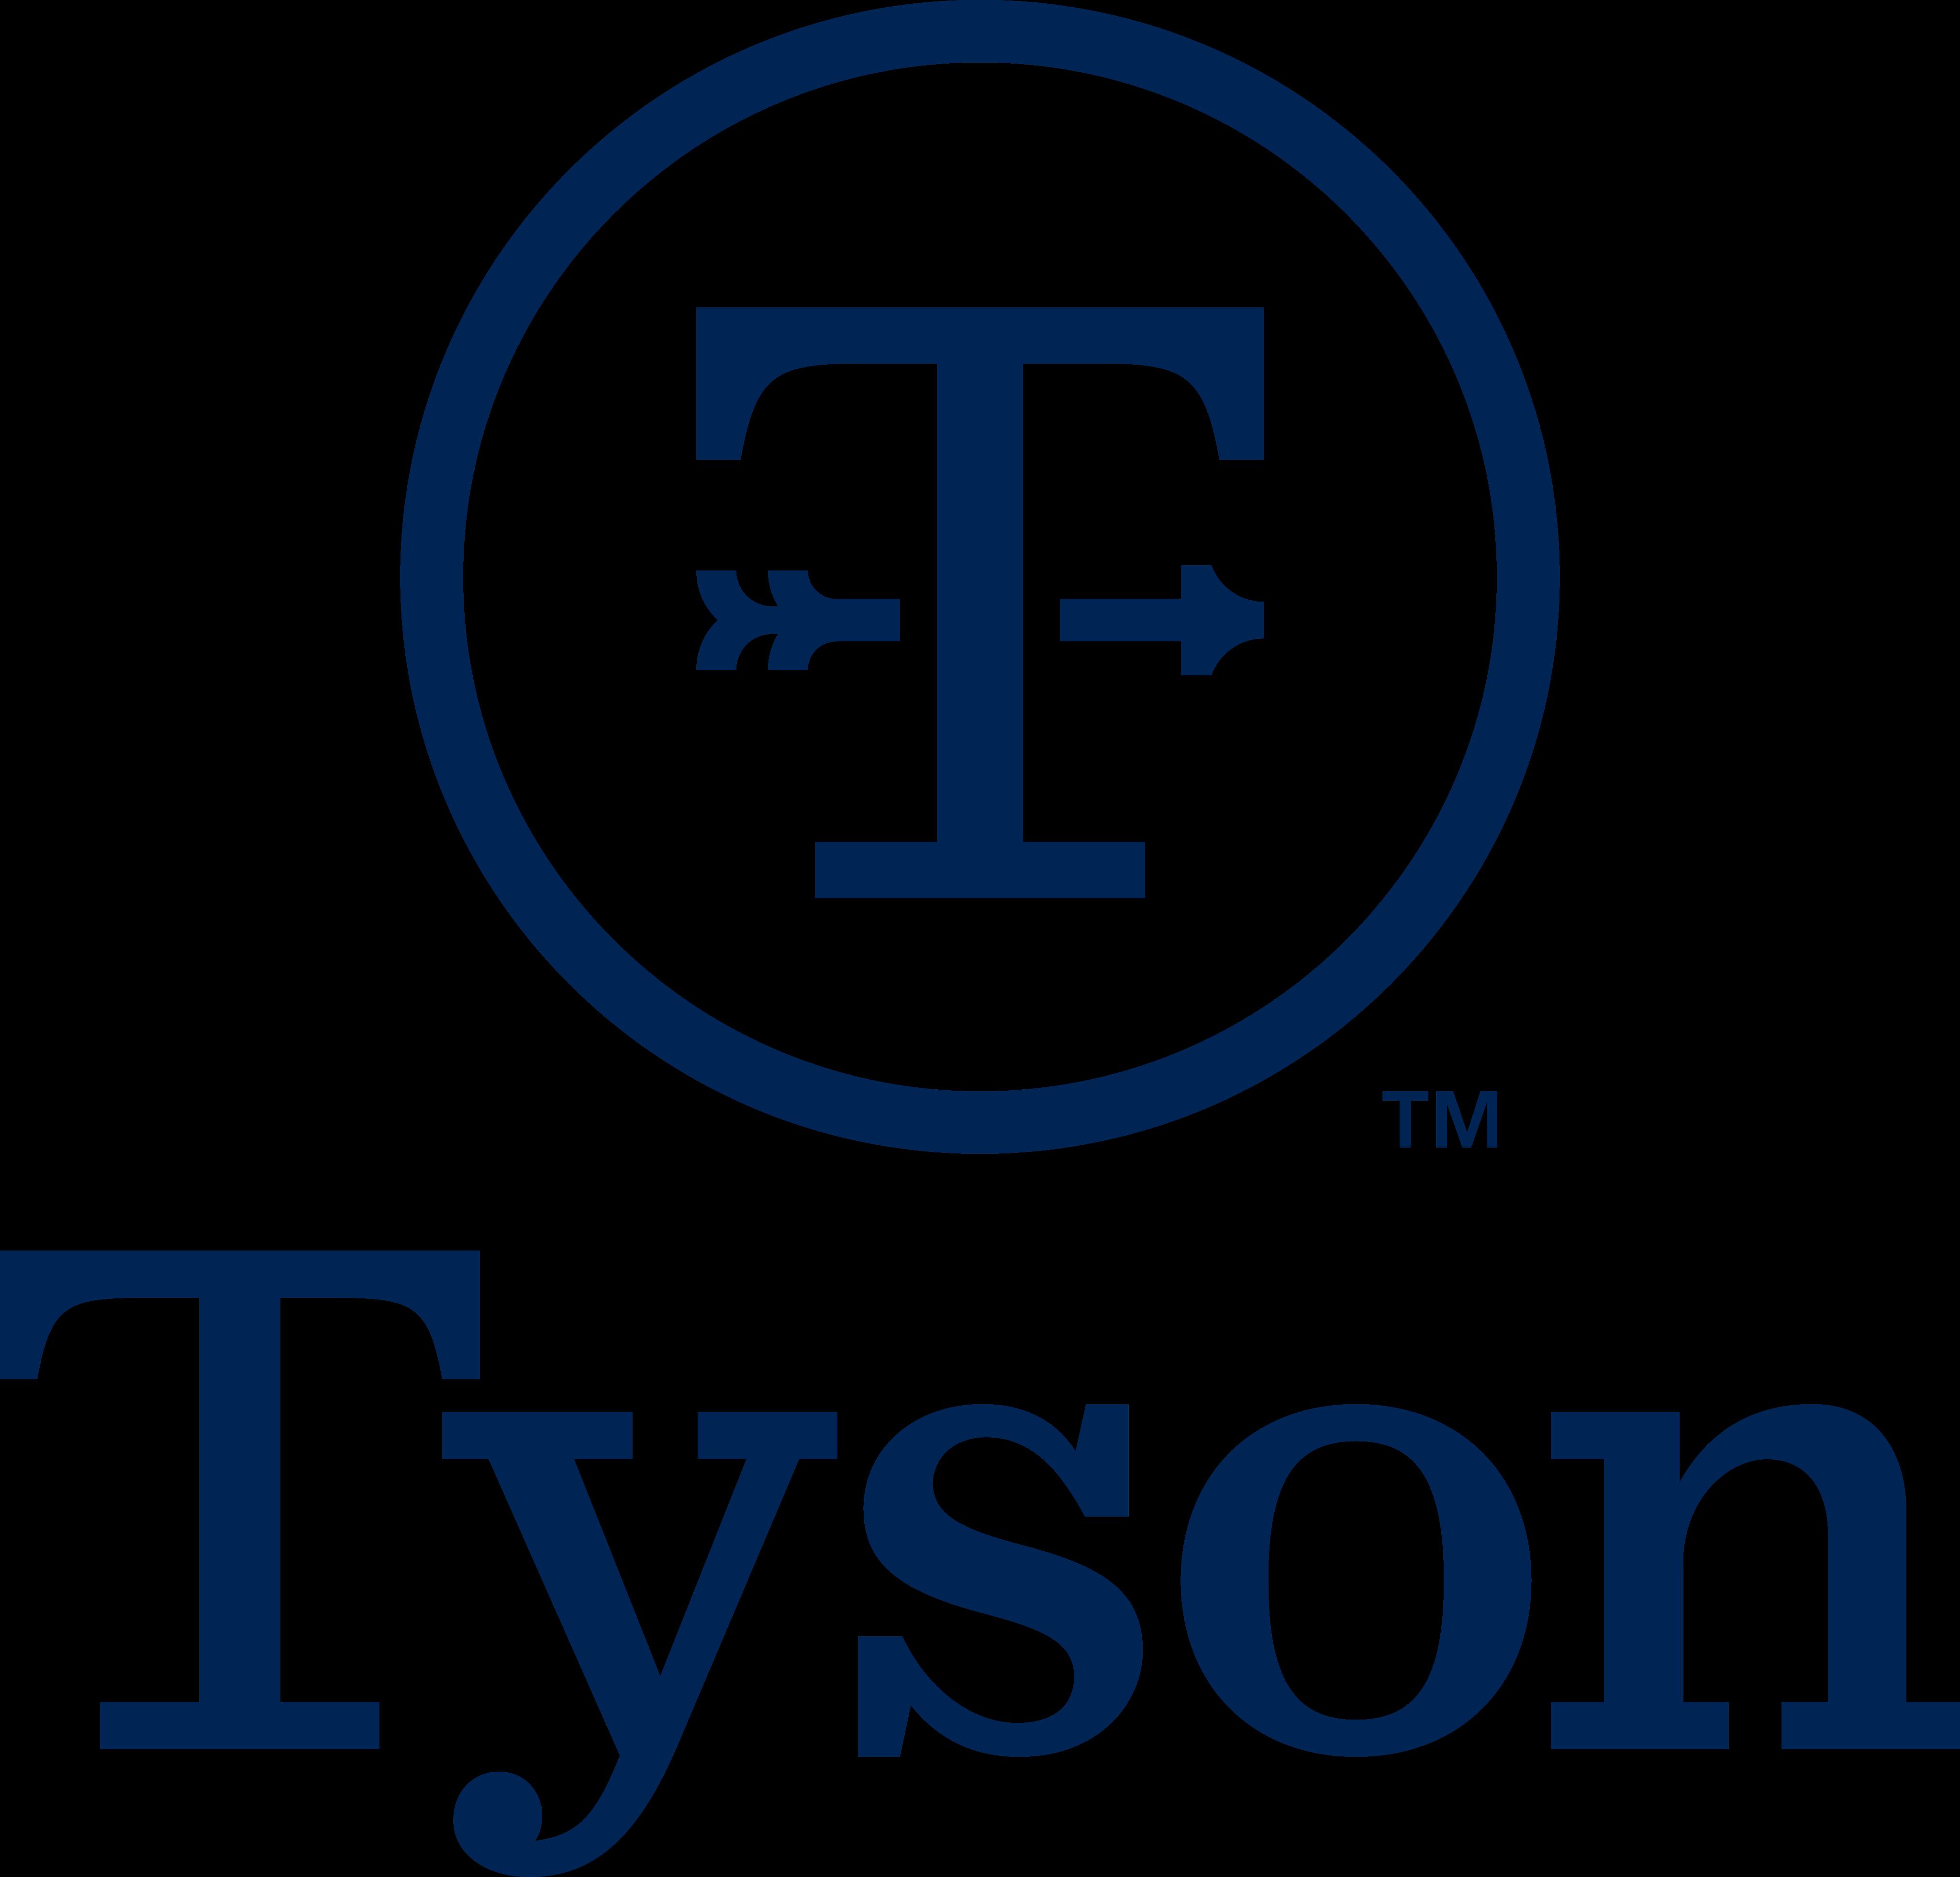 tyson foods logo 1 - Tyson Foods Logo